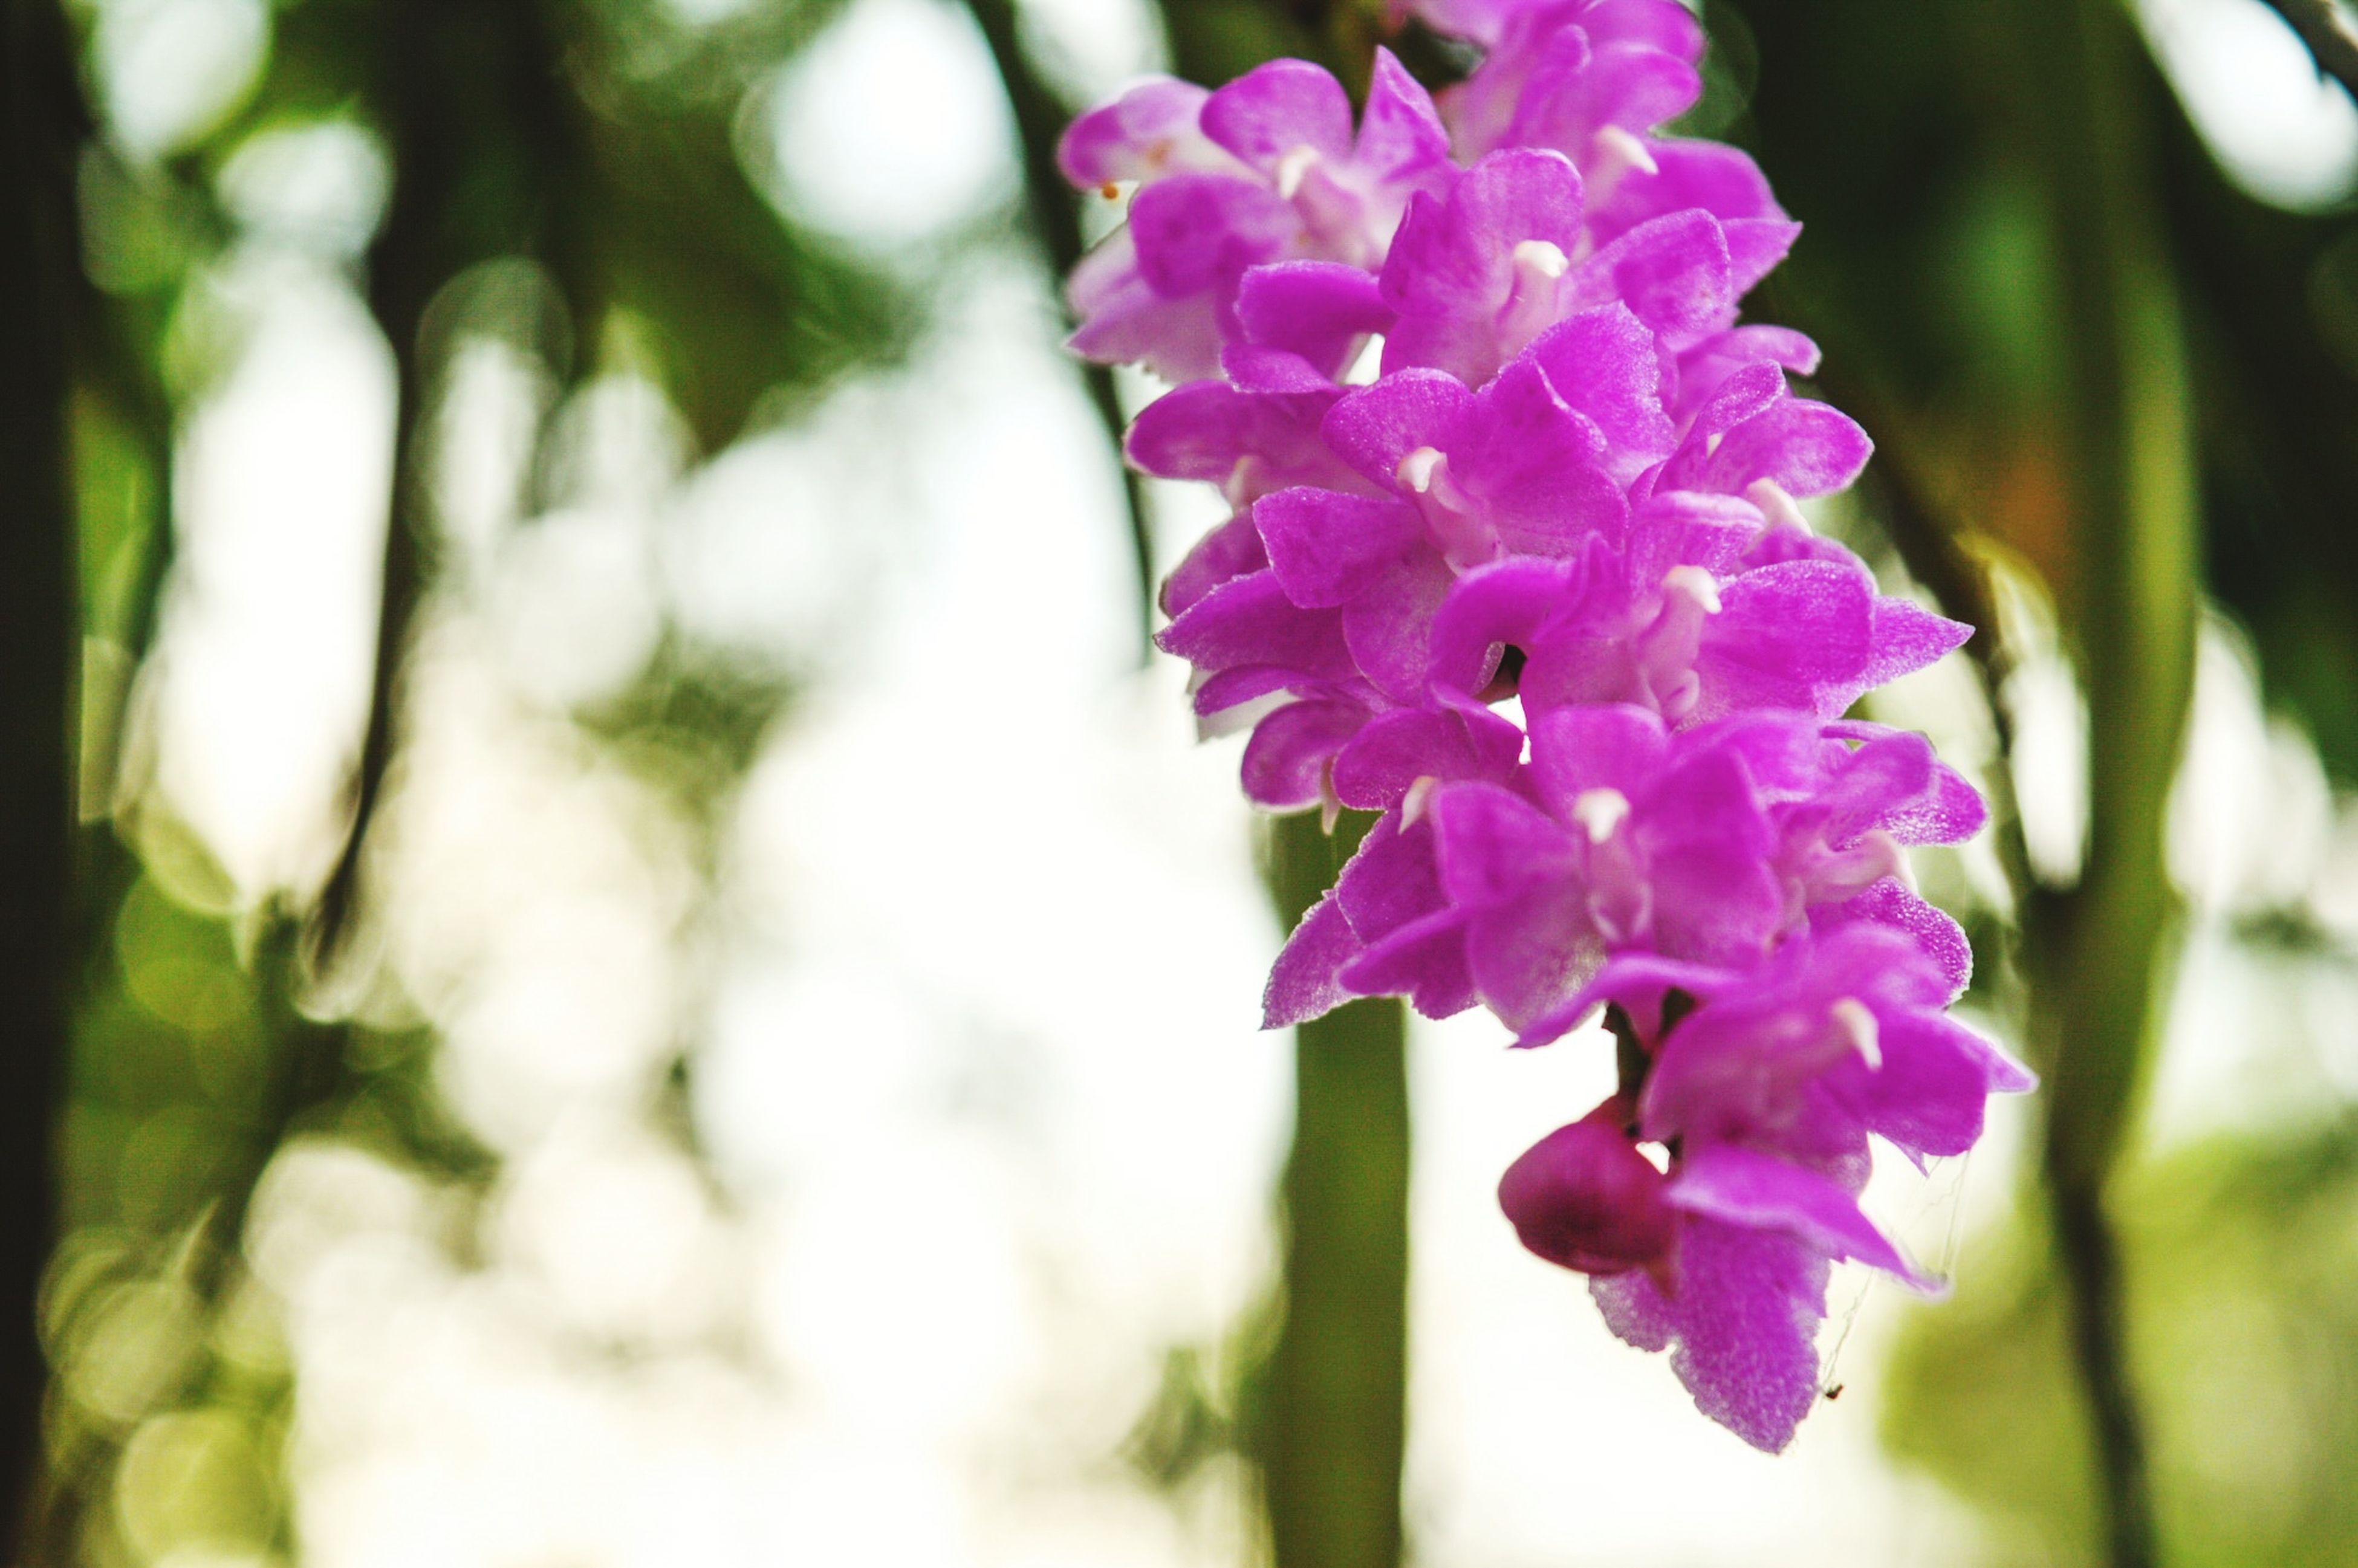 Meghalaya Westgarohills Orchid Orchid Blossoms Landofclouds Nature Photography Nature EyeMeCapture Naturelovers Nature Lover